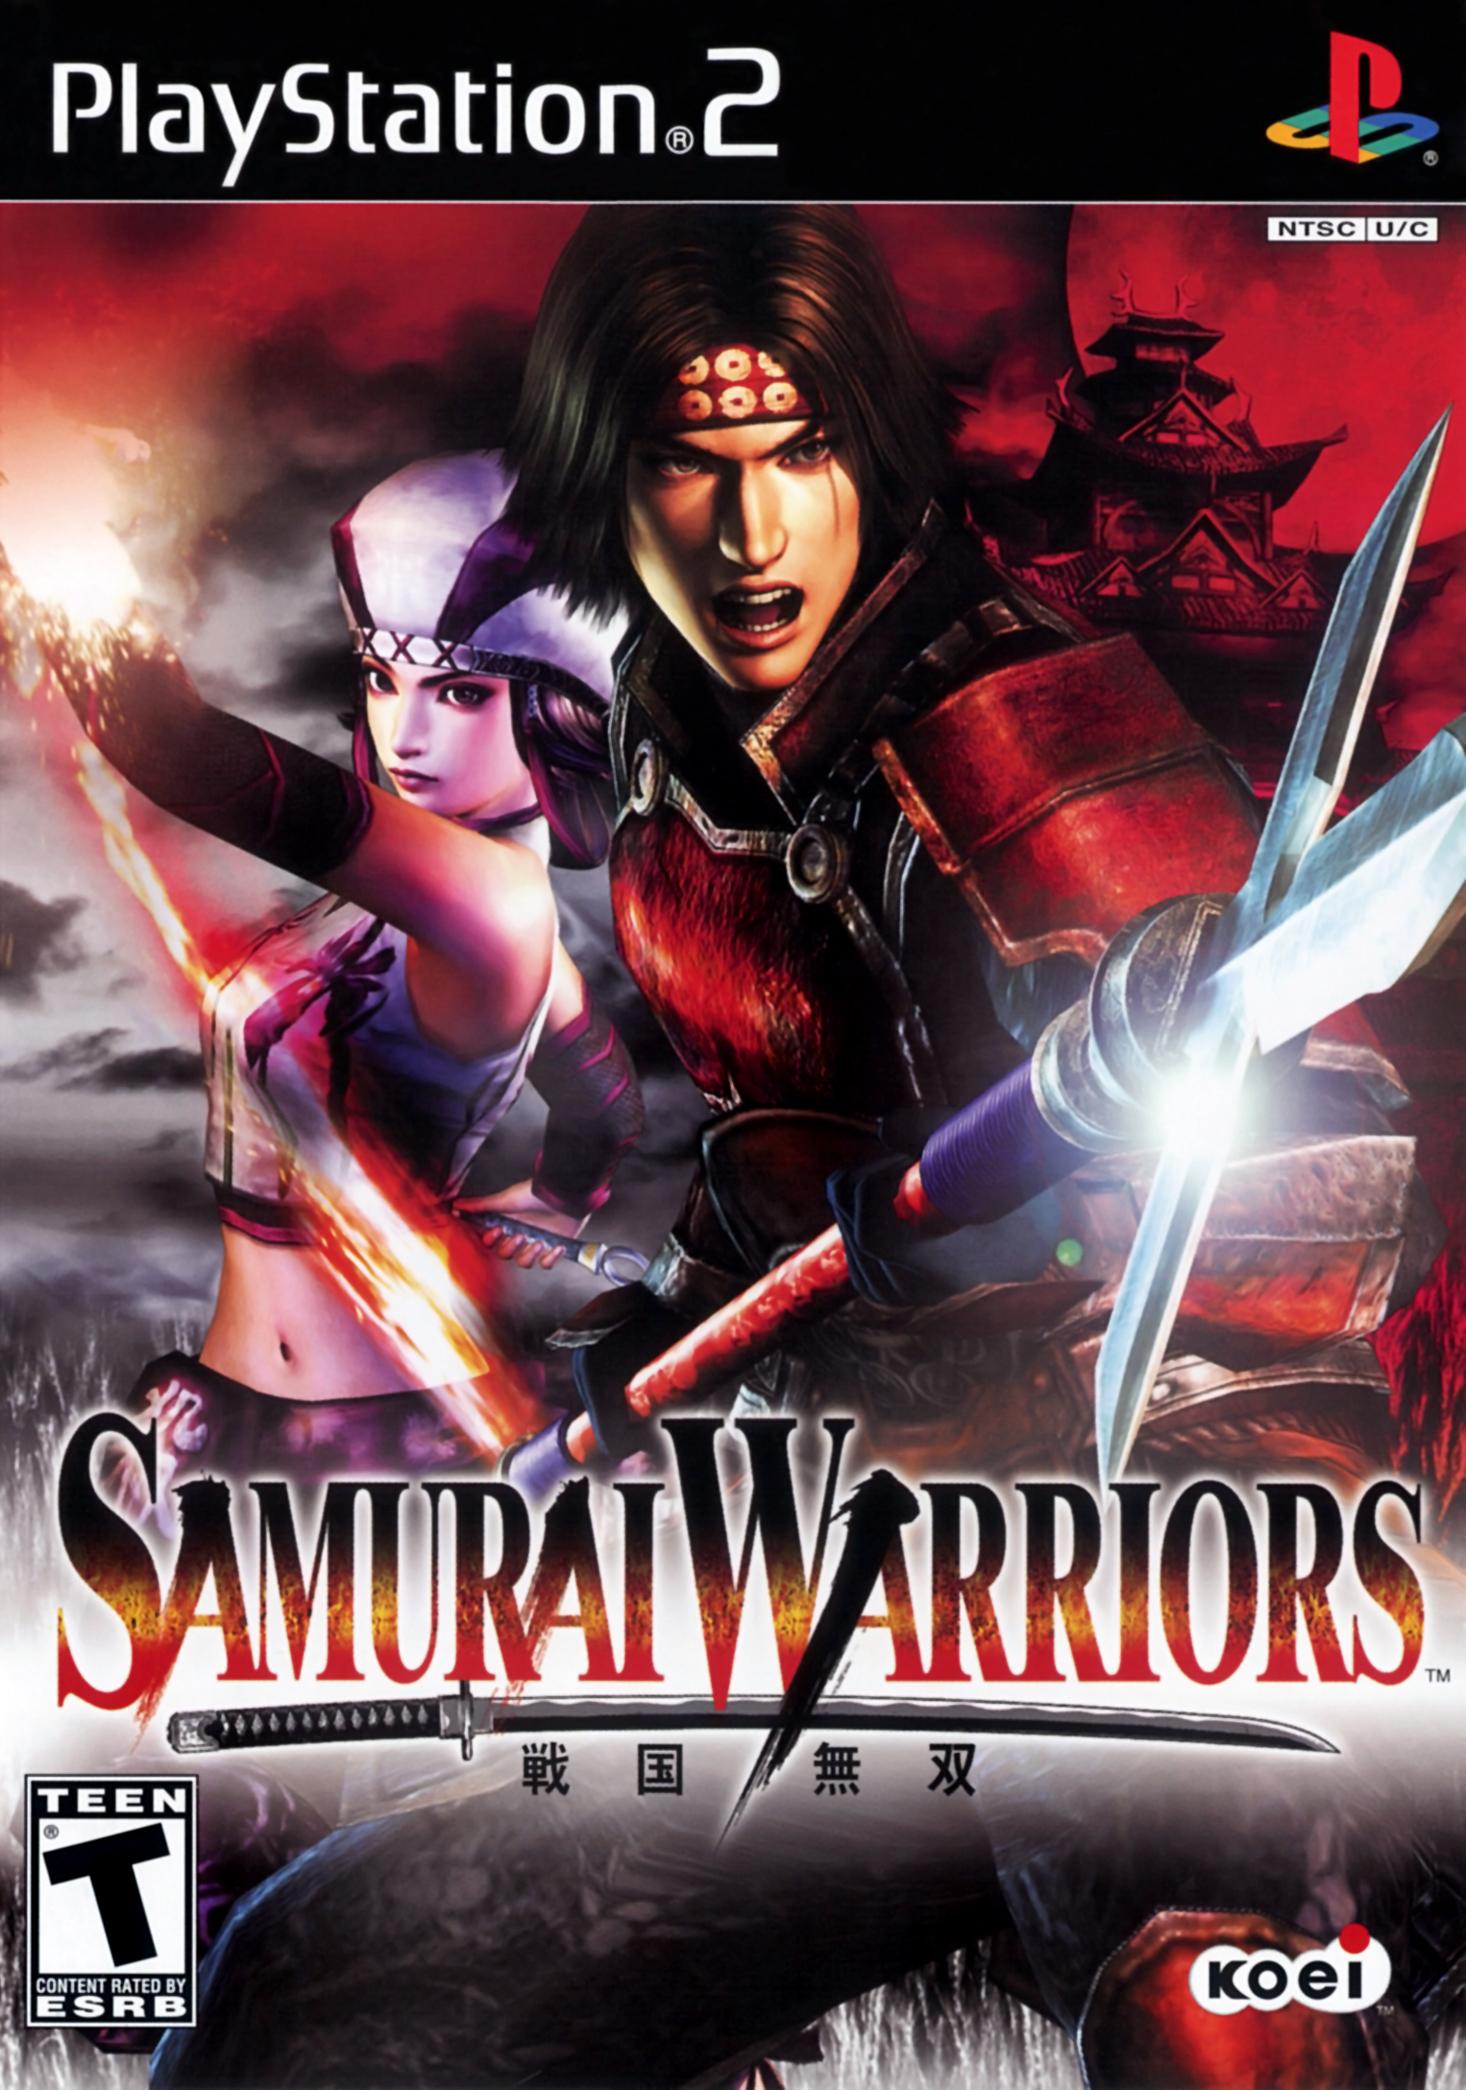 http://vignette1.wikia.nocookie.net/dynastywarriors/images/9/96/Samurai_Warriors_Case.jpg/revision/latest?cb=20130421061639